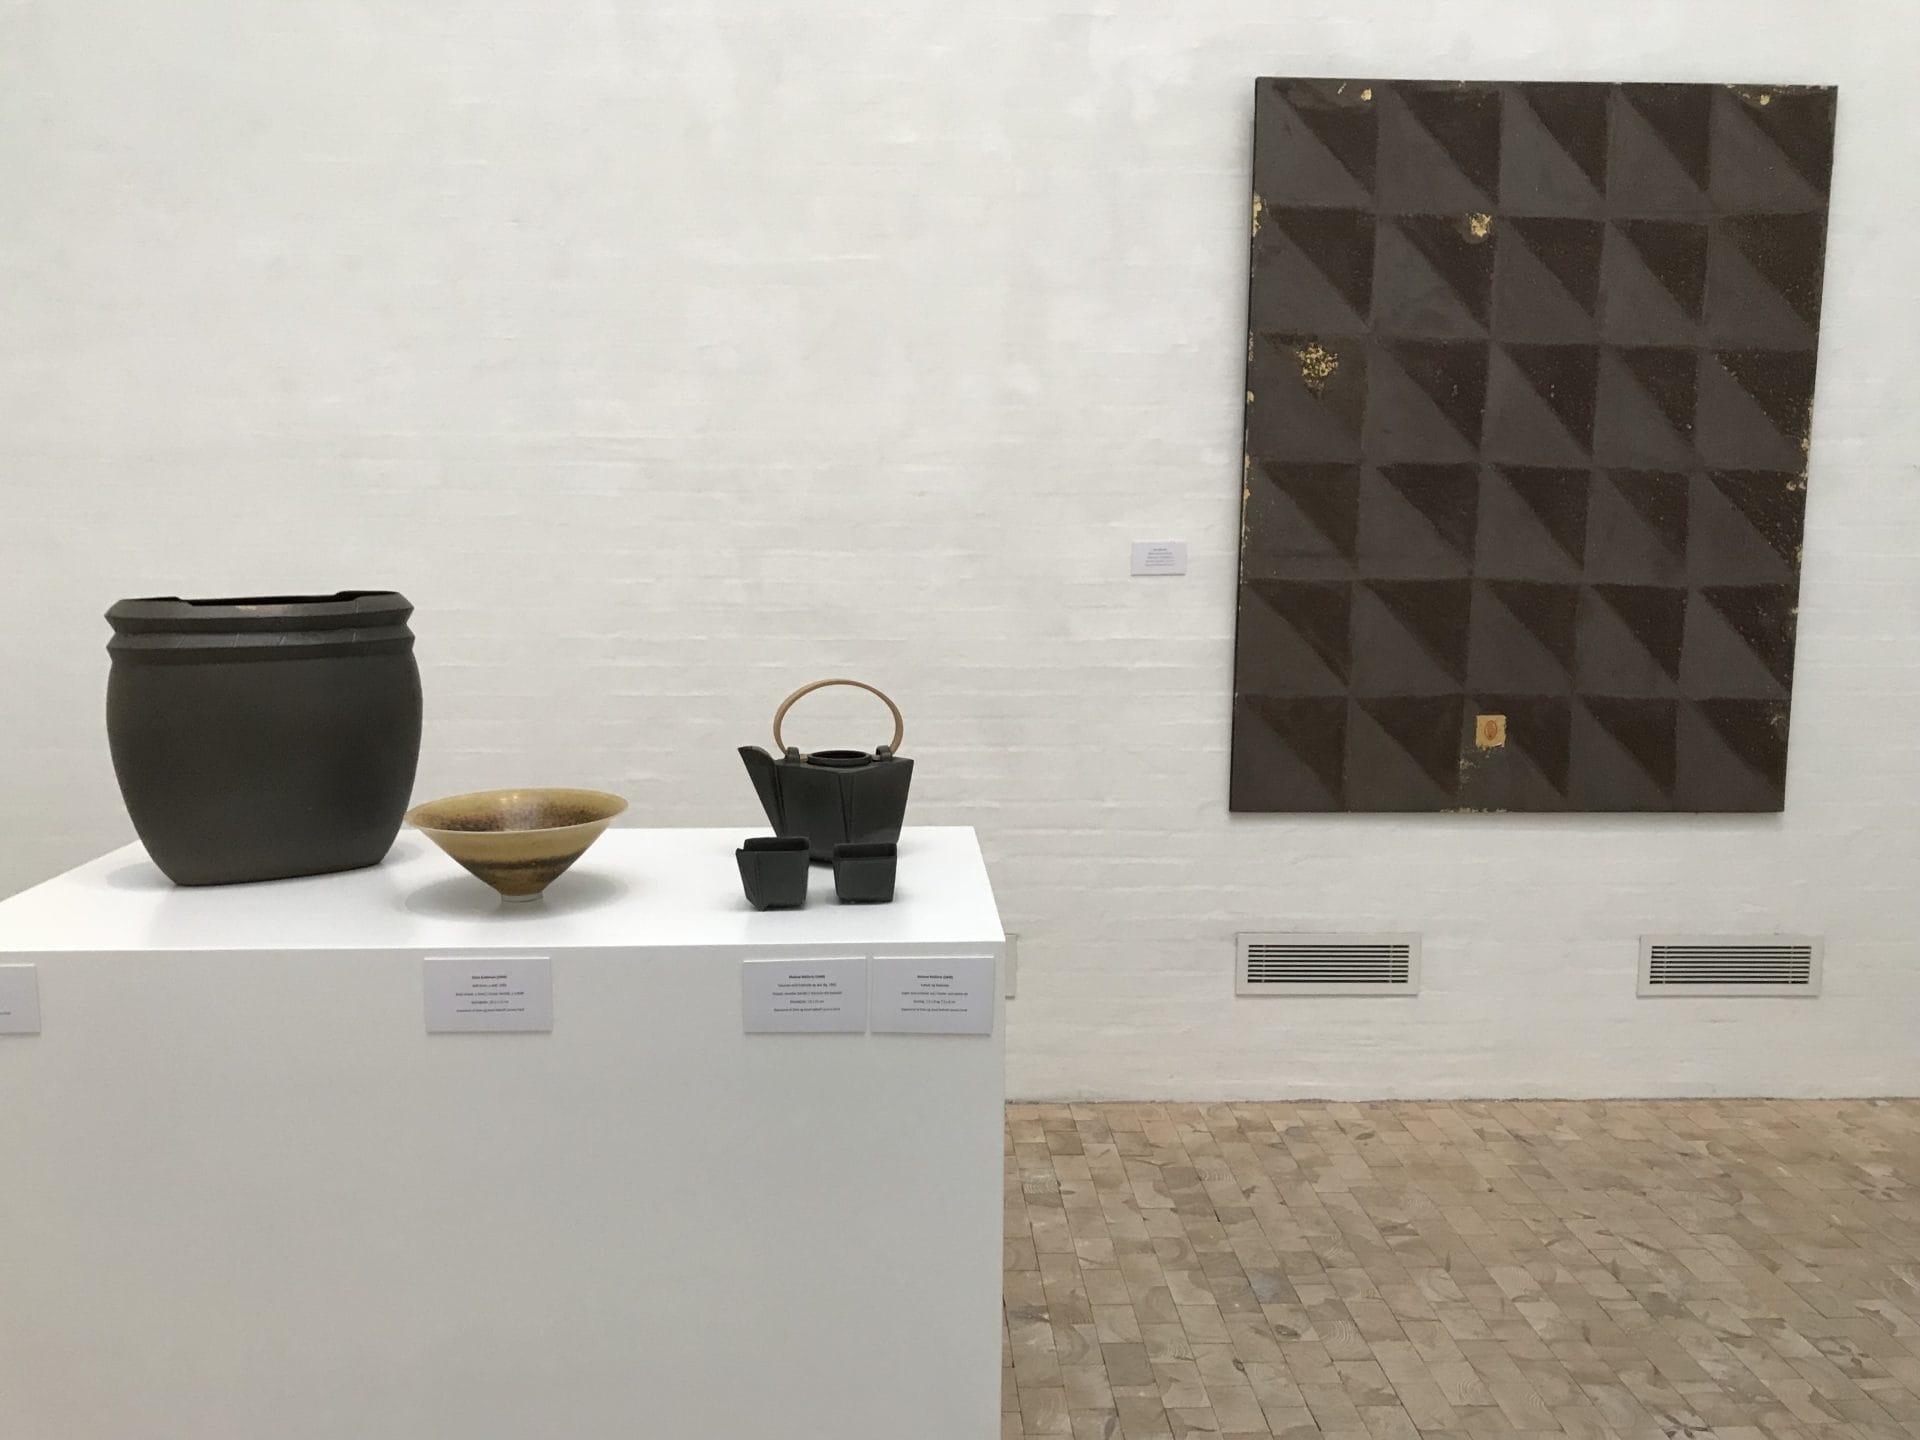 Keramik fra Ellen & Knud Dalhoff Larsen Fonden